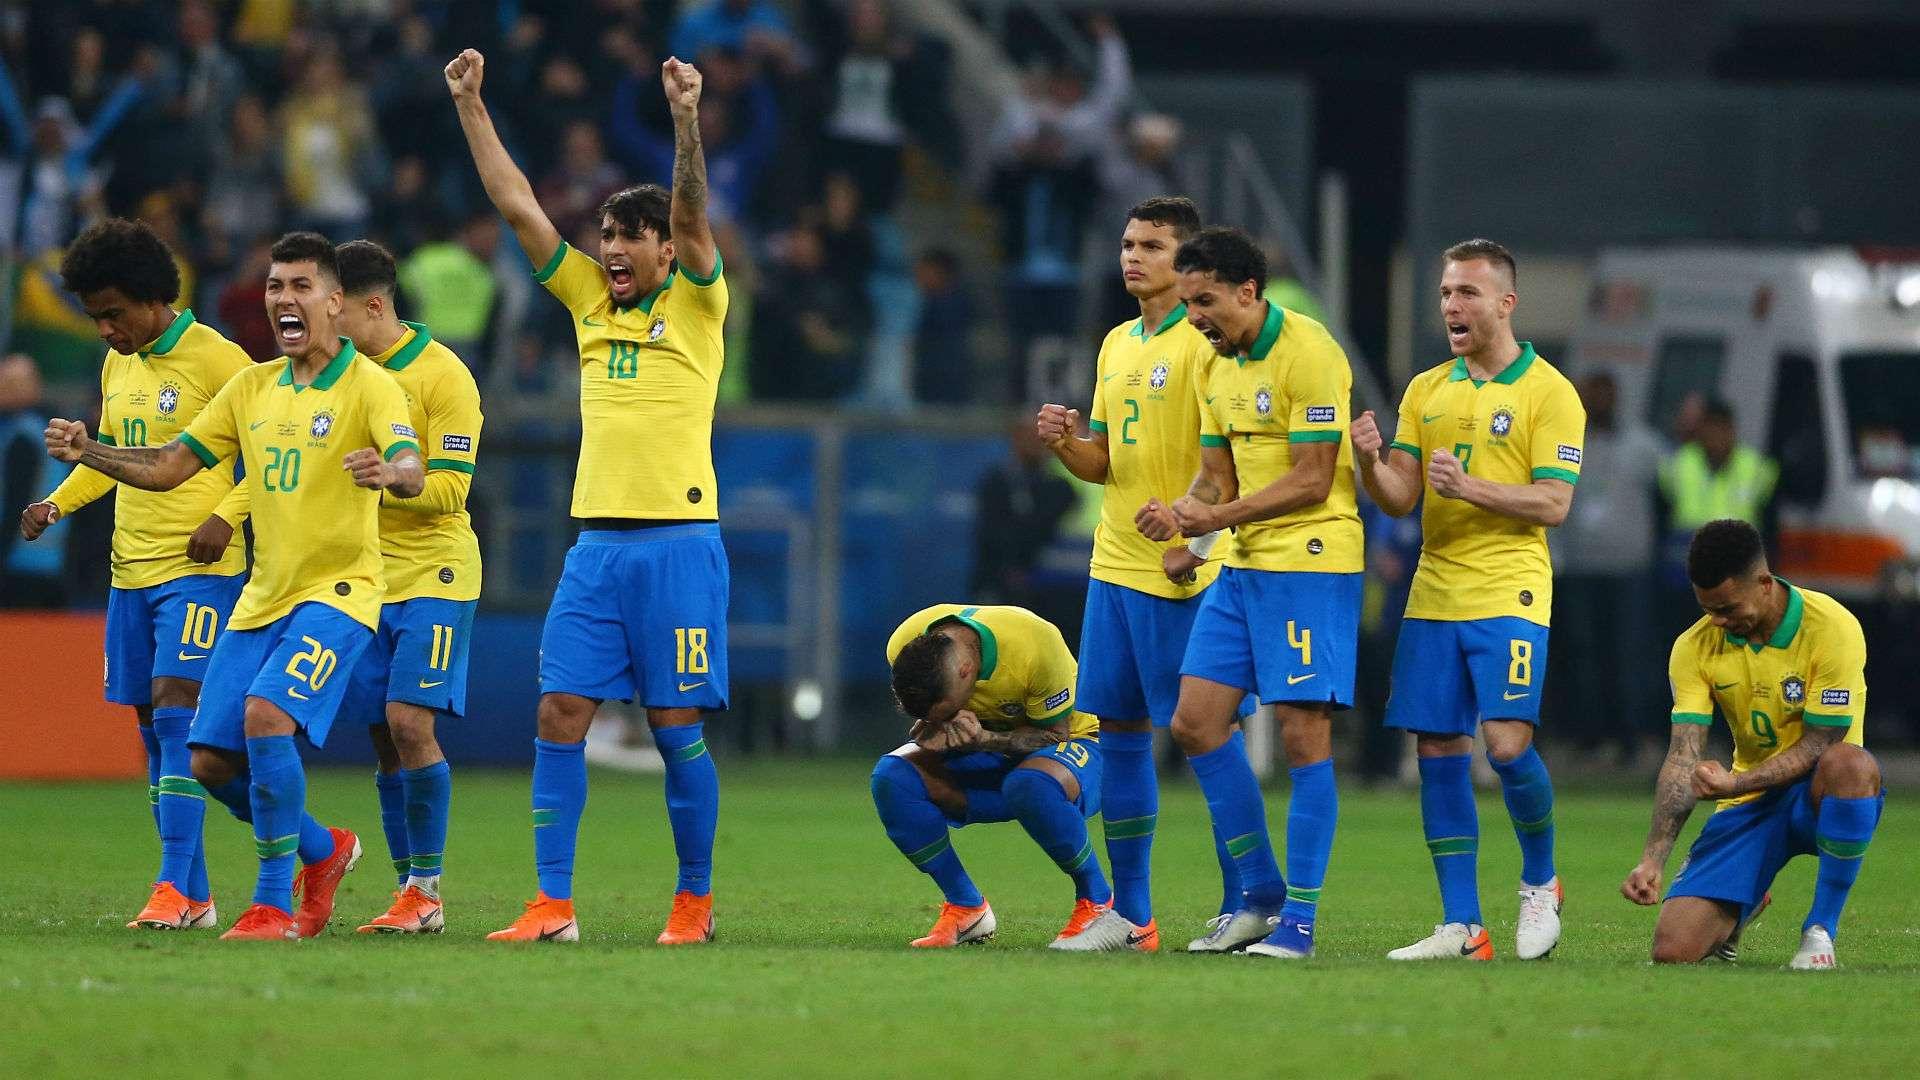 Polêmica sobre Copa América. Será a Cepa América?